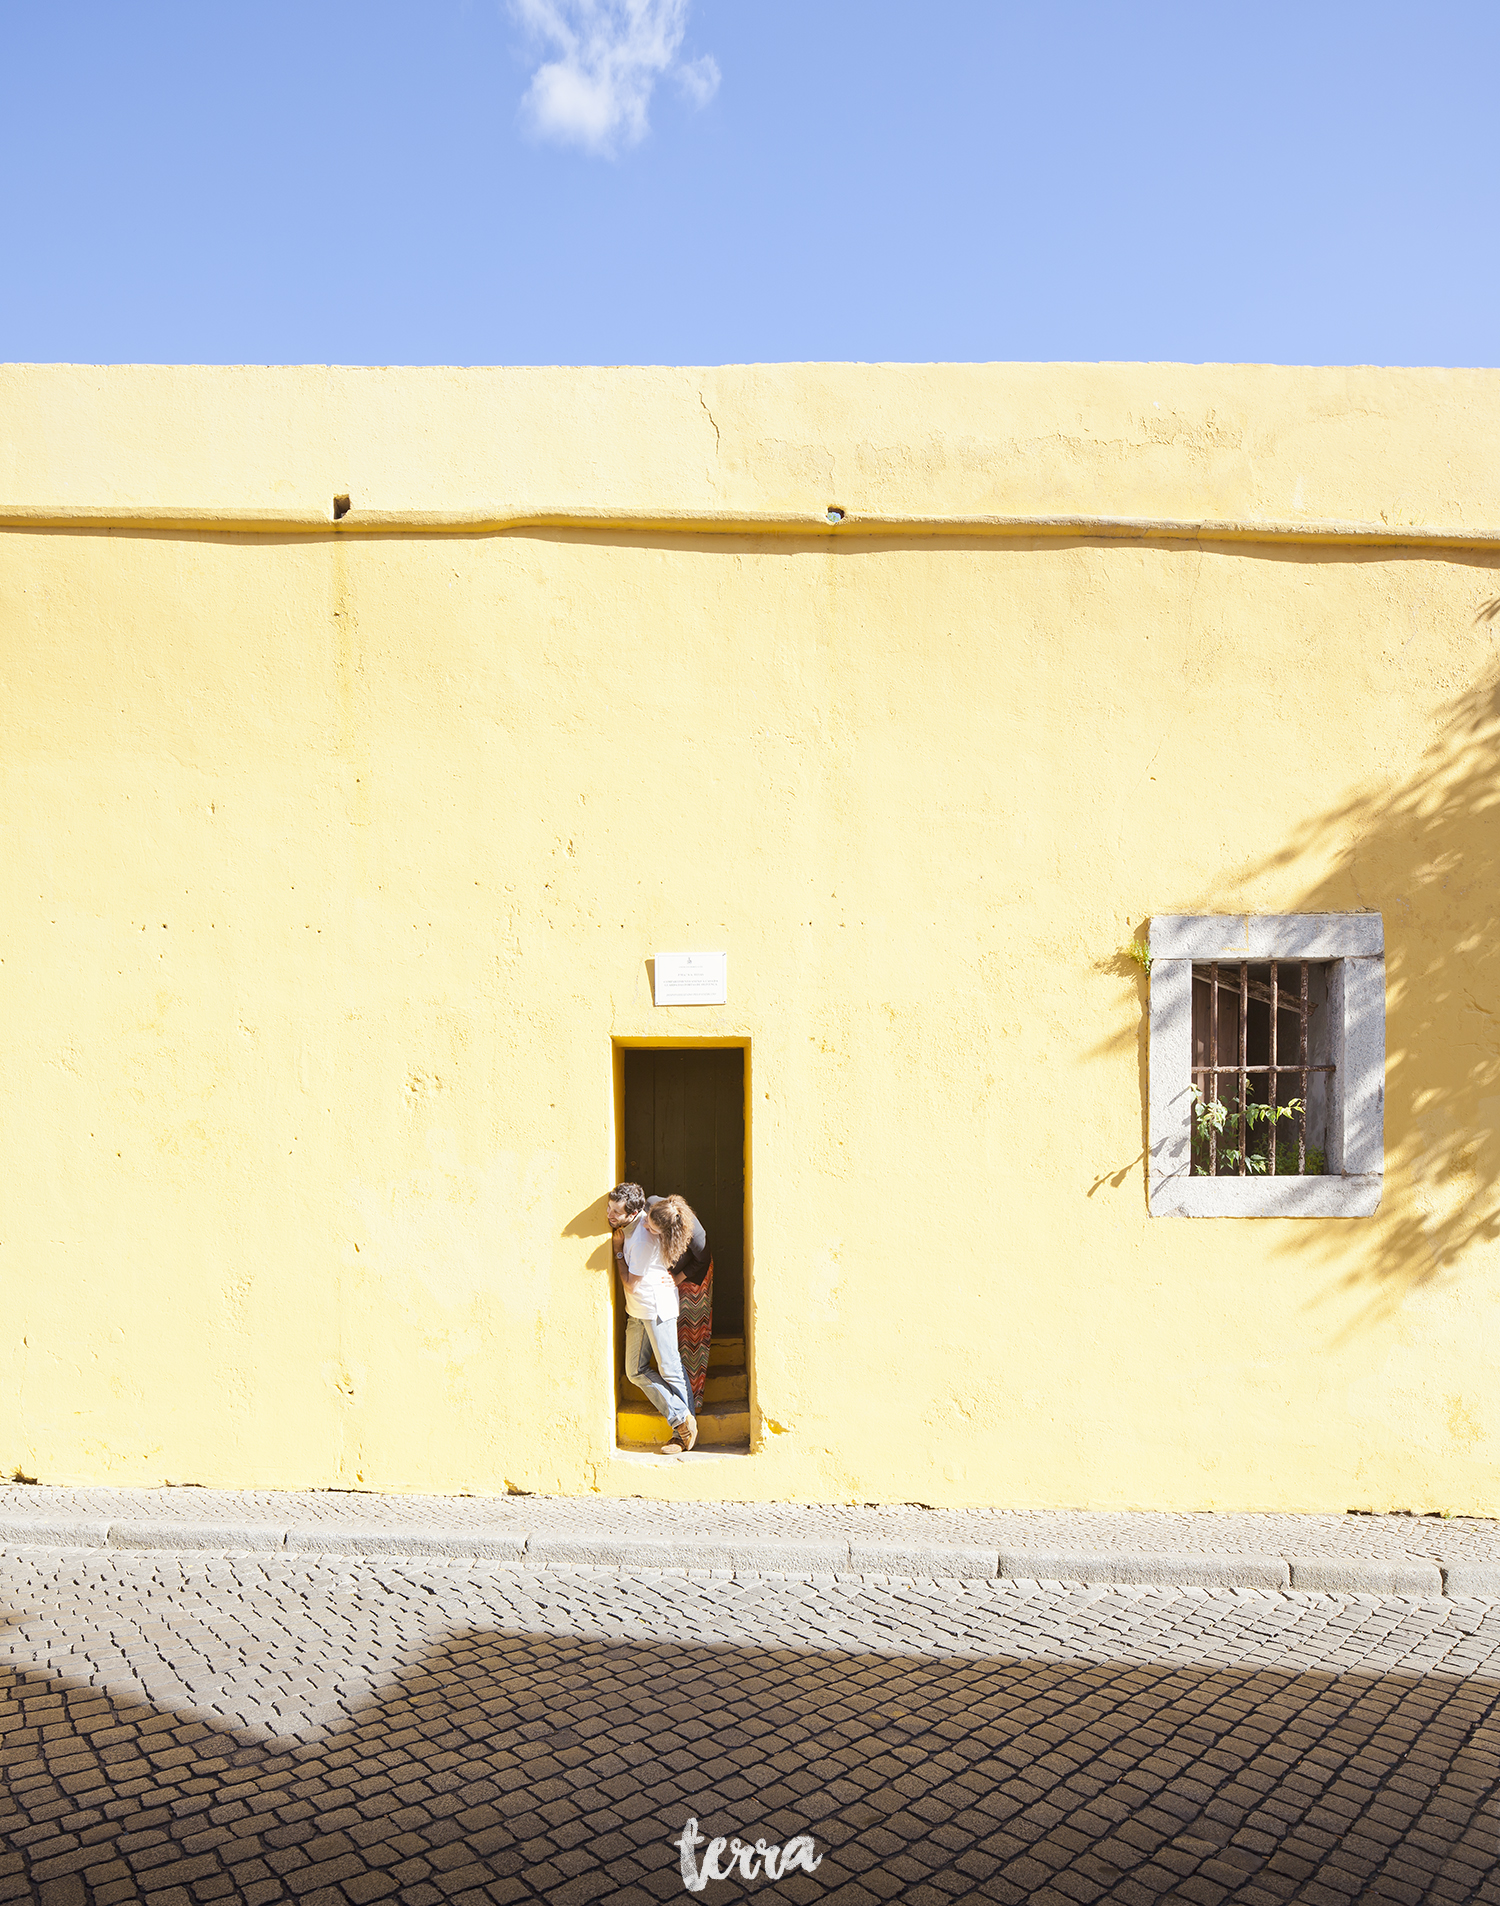 sessao-fotografica-casal-forte-nossa-senhora-graca-elvas-terra-fotografia-0013.jpg